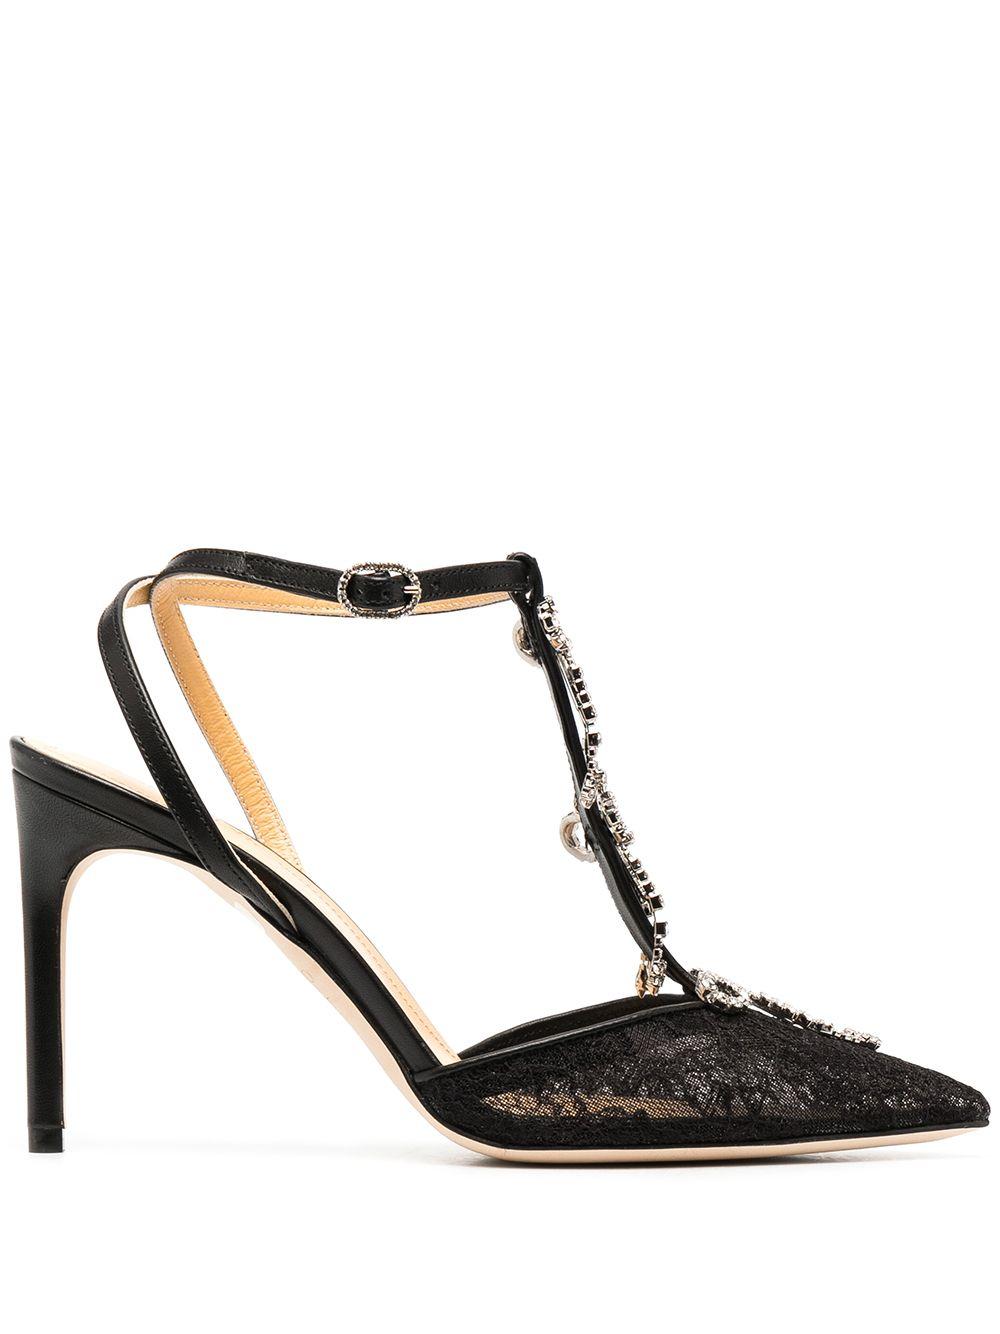 sandalo nero GIANNICO | Scarpe | GI0149.90CP30190018